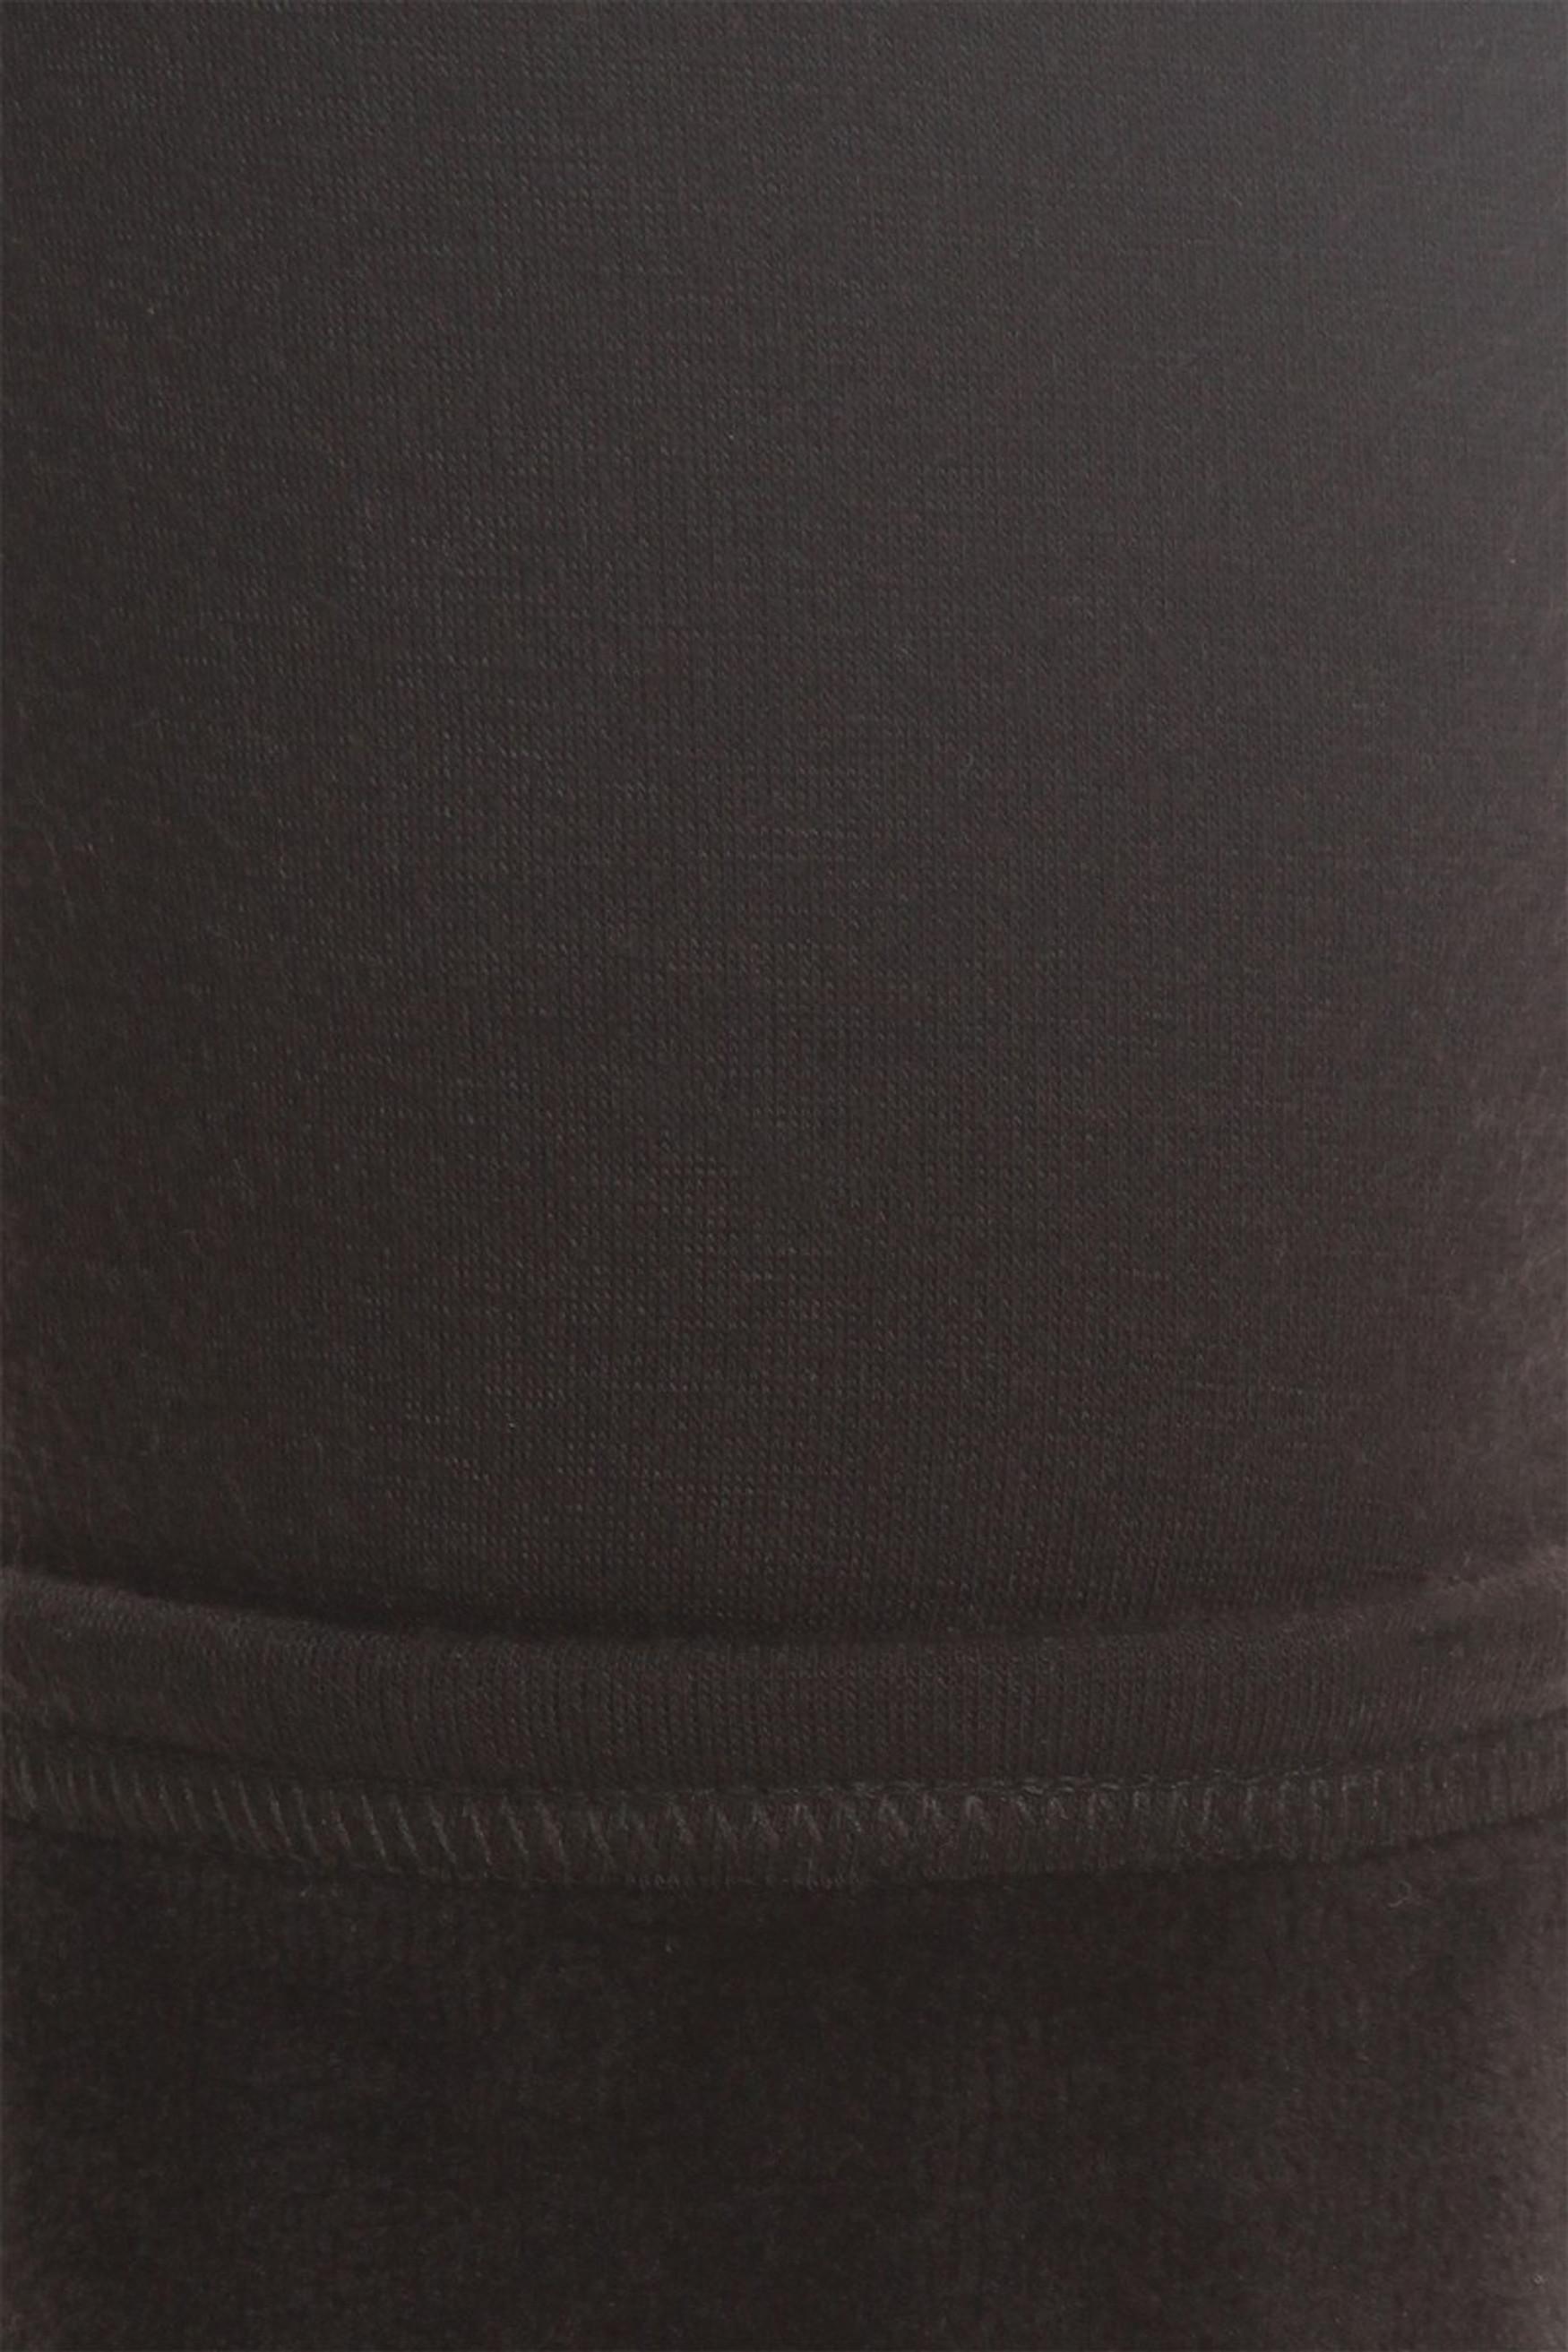 Solid Black Fur Lined Leggings - Plus Size